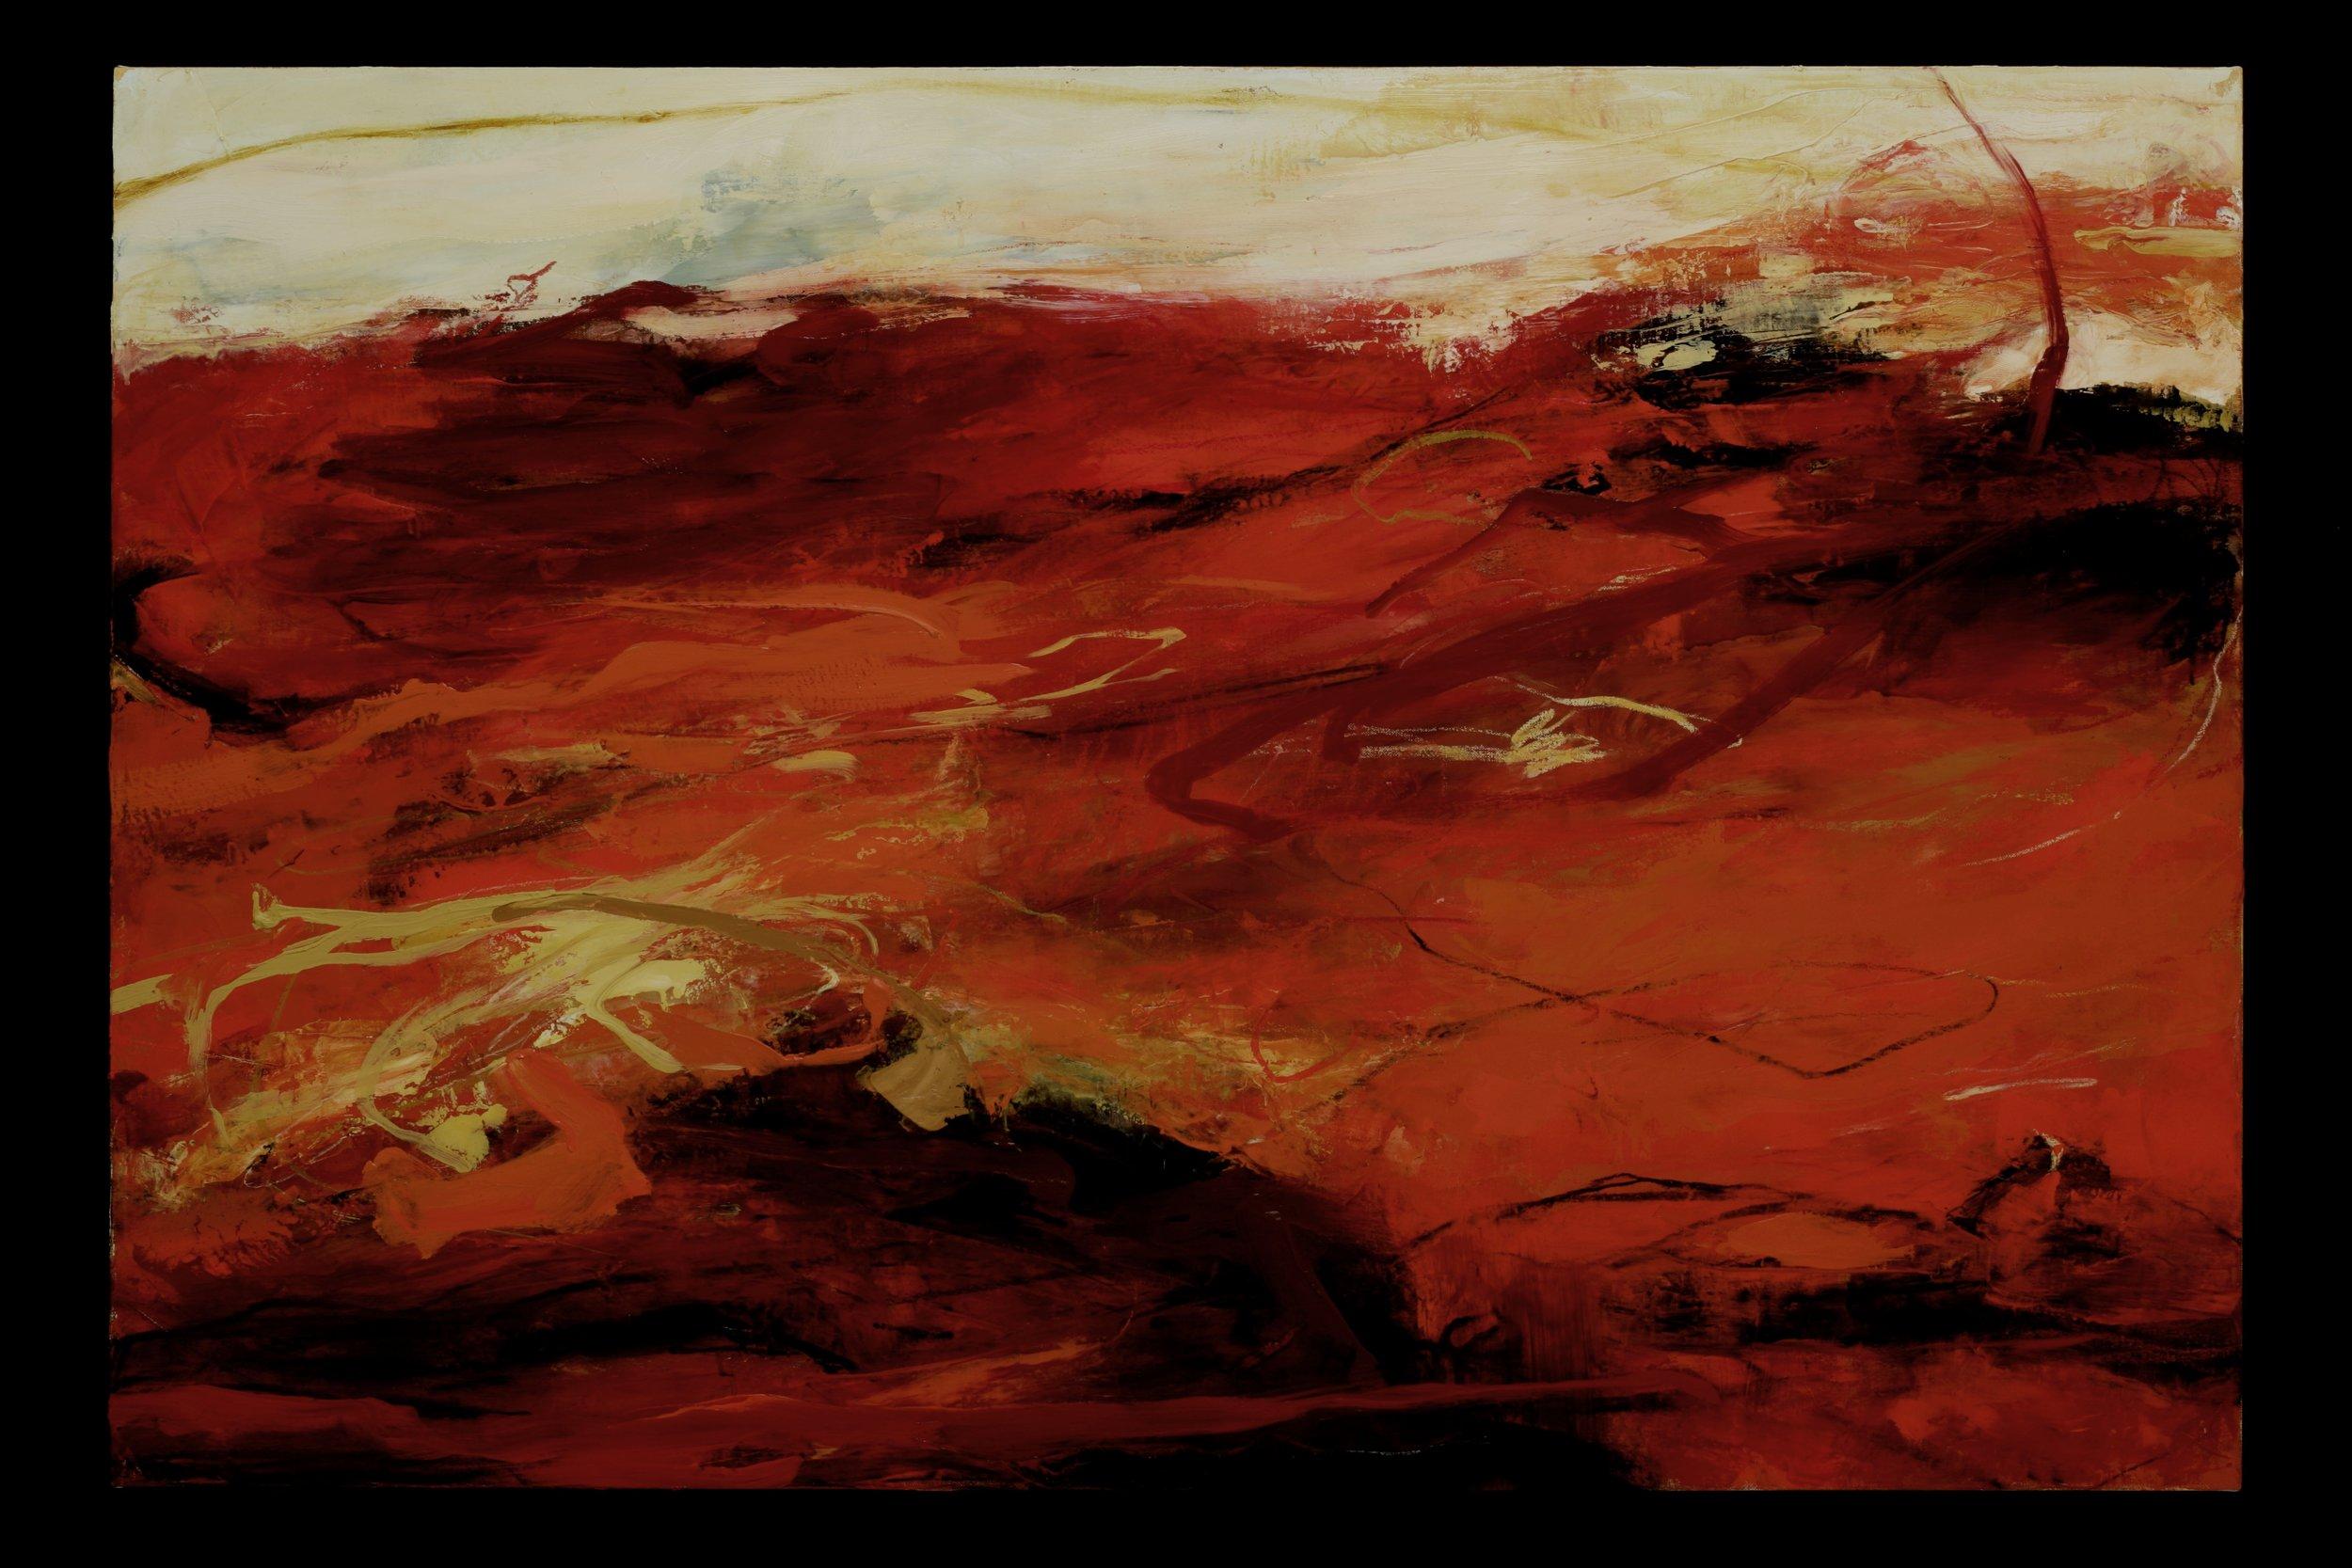 "Waterpainting 1, Oil, alkyd, wax on linen, 36""x54"""